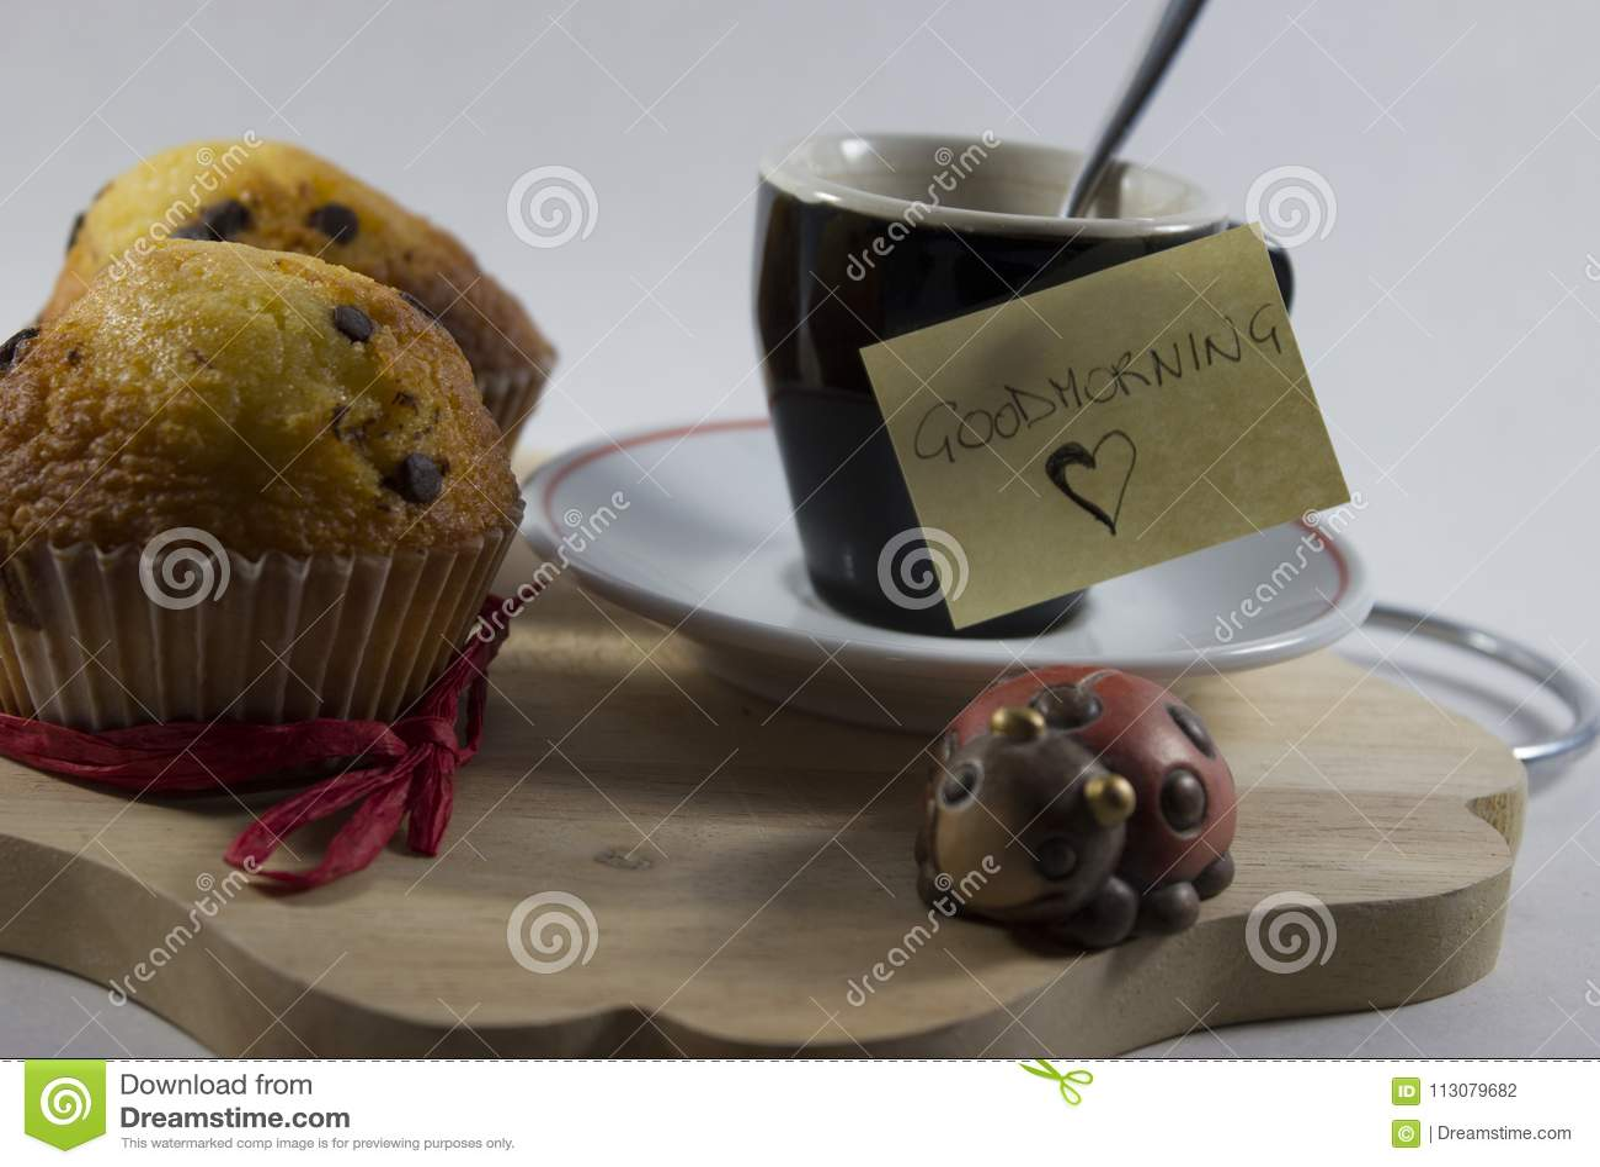 Good morning background, lucky breakfast set